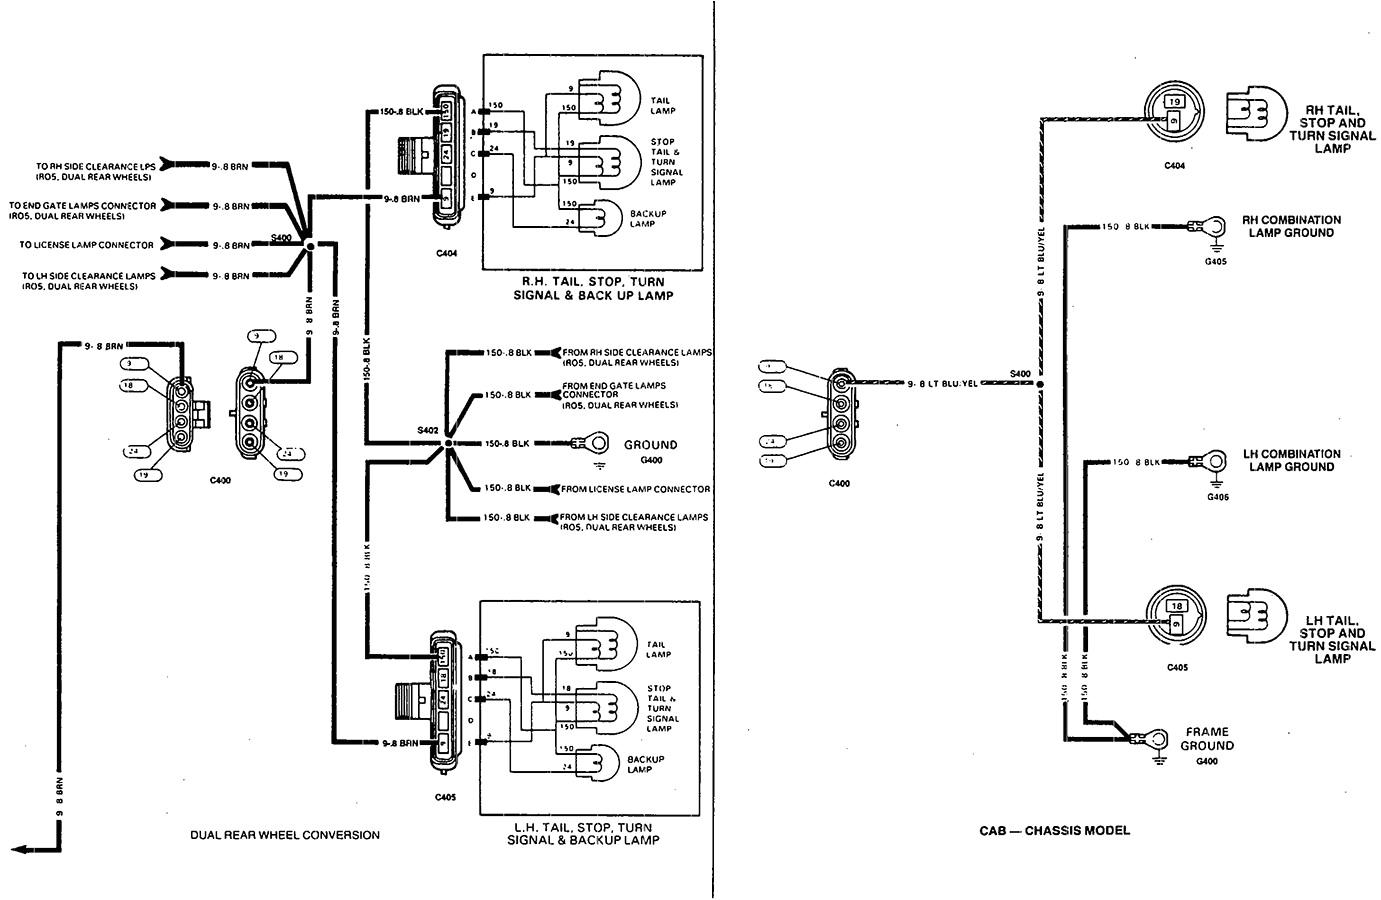 chevrolet tail light wiring harness wiring diagram all 1988 chevy truck tail light wiring harness